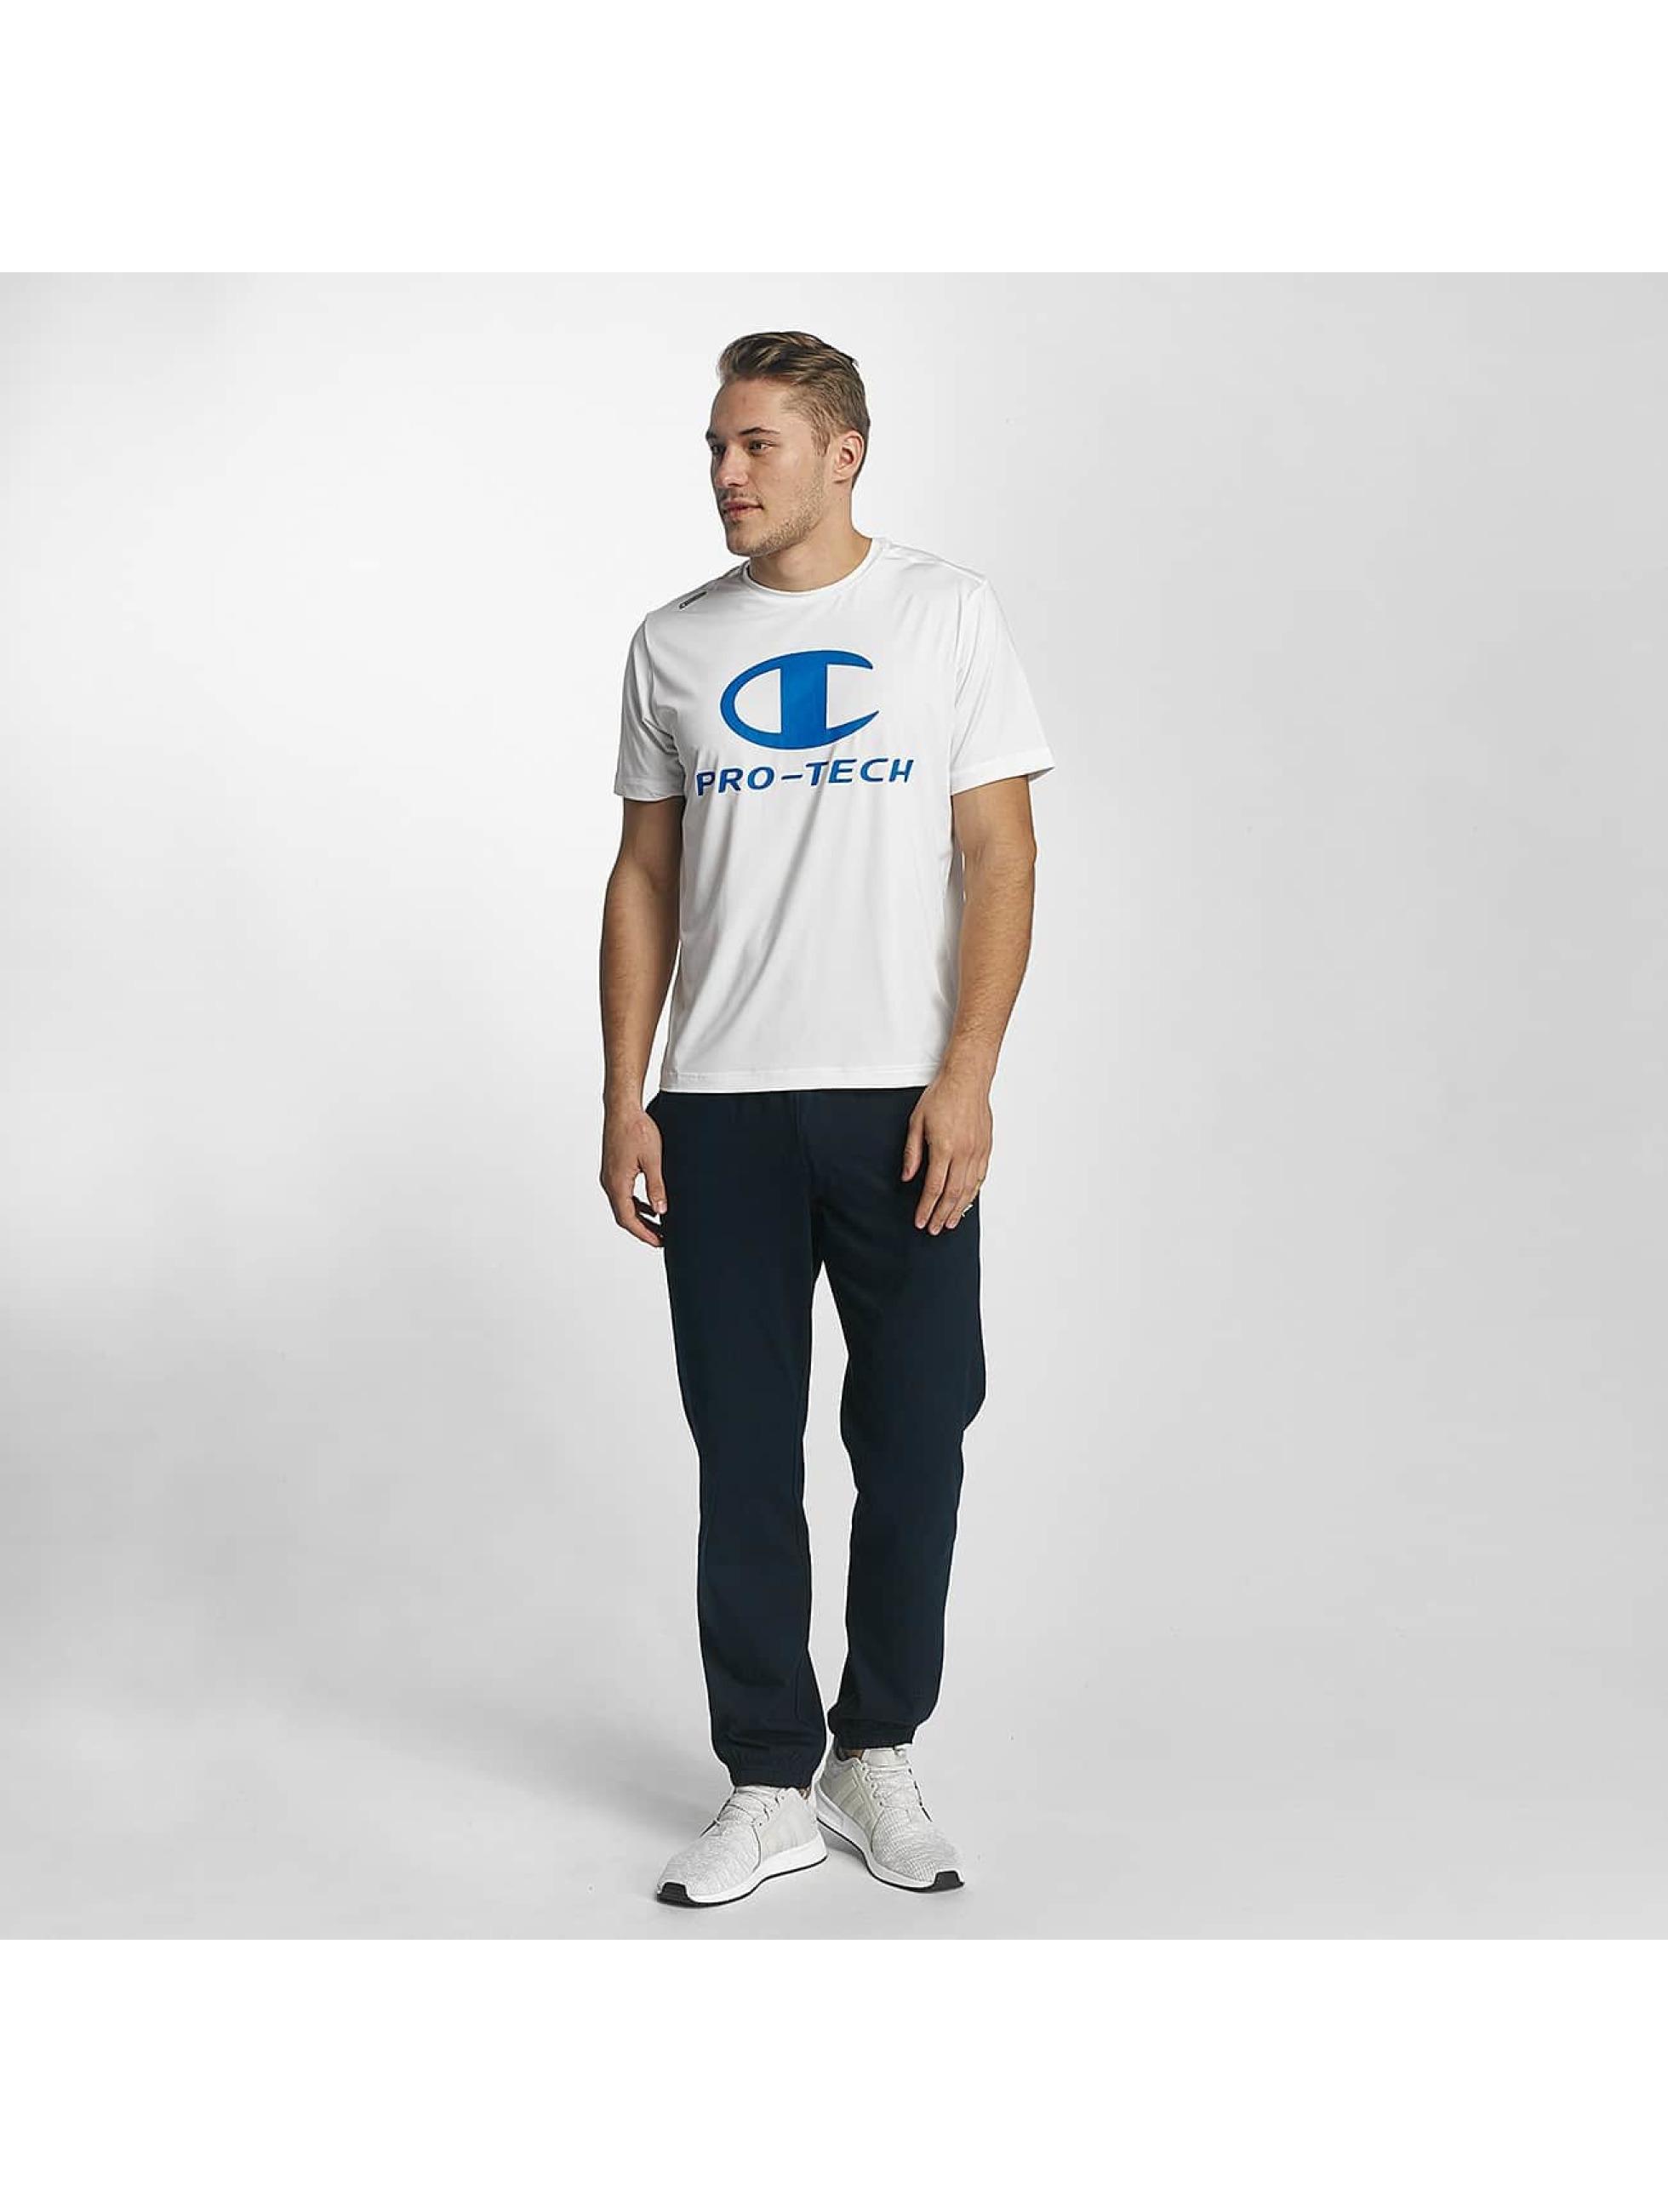 Champion Athletics T-Shirt Pro Tech white